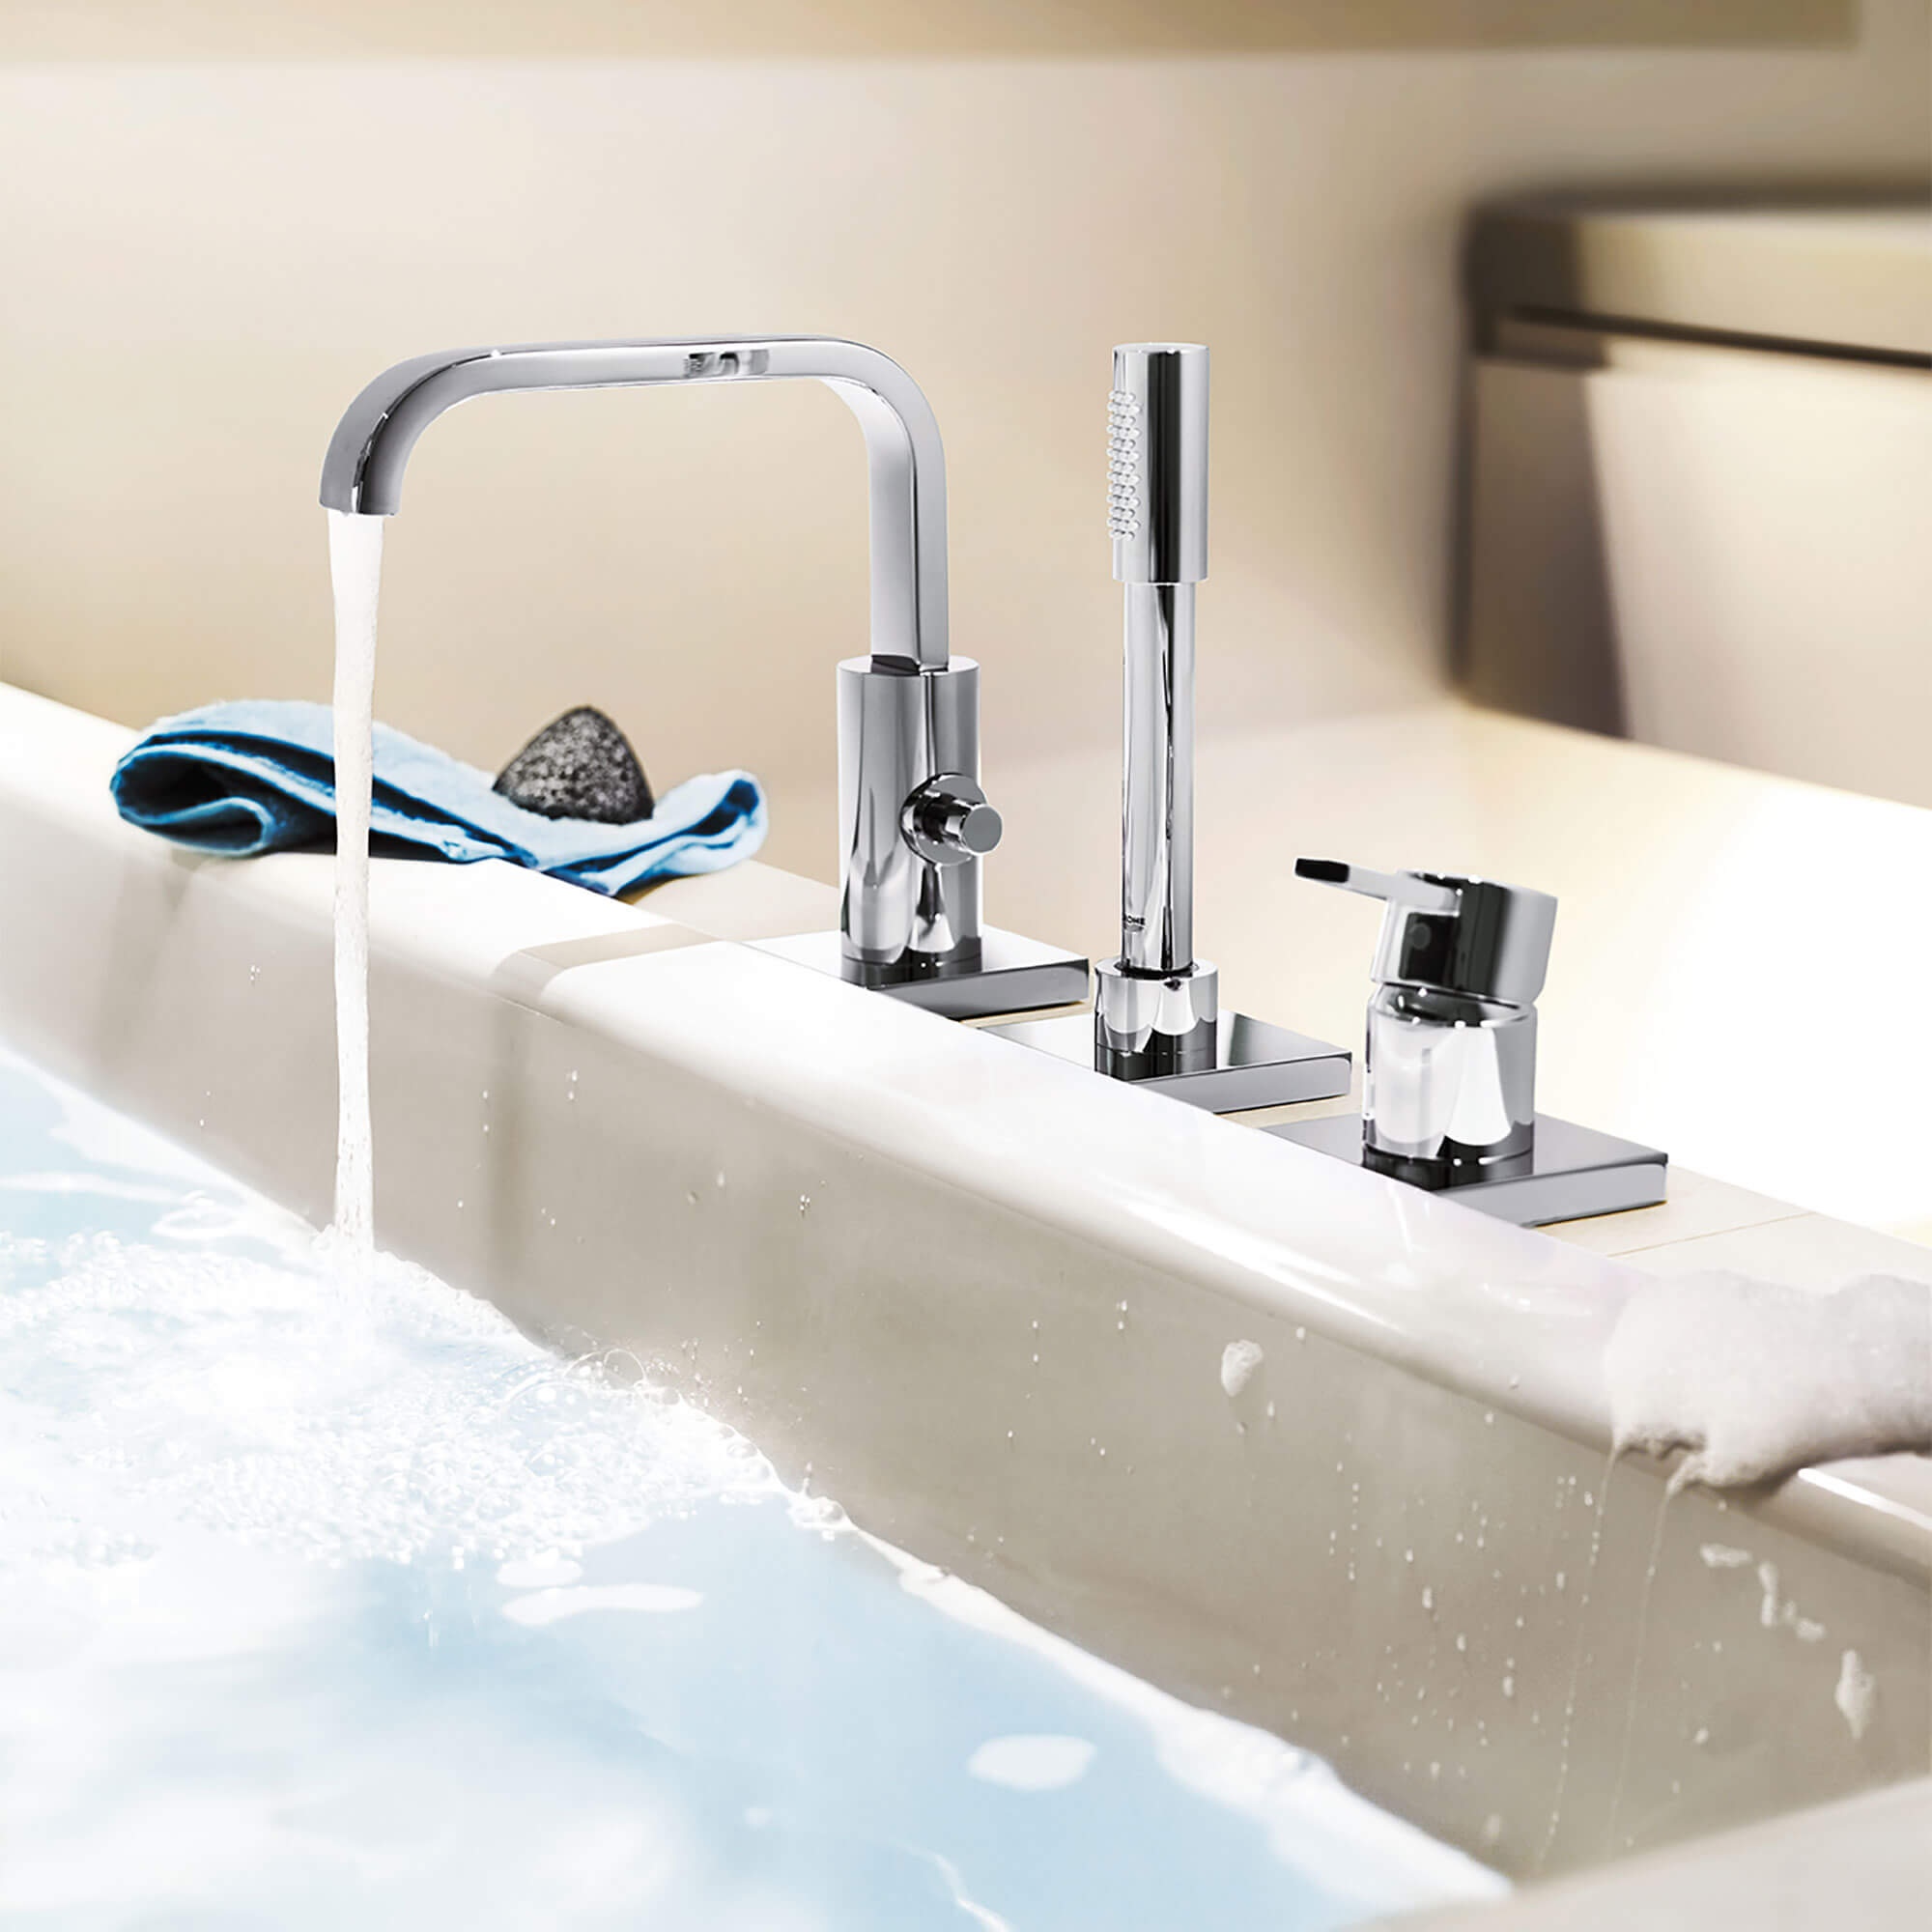 Robinet de salle de bain GROHE Allure